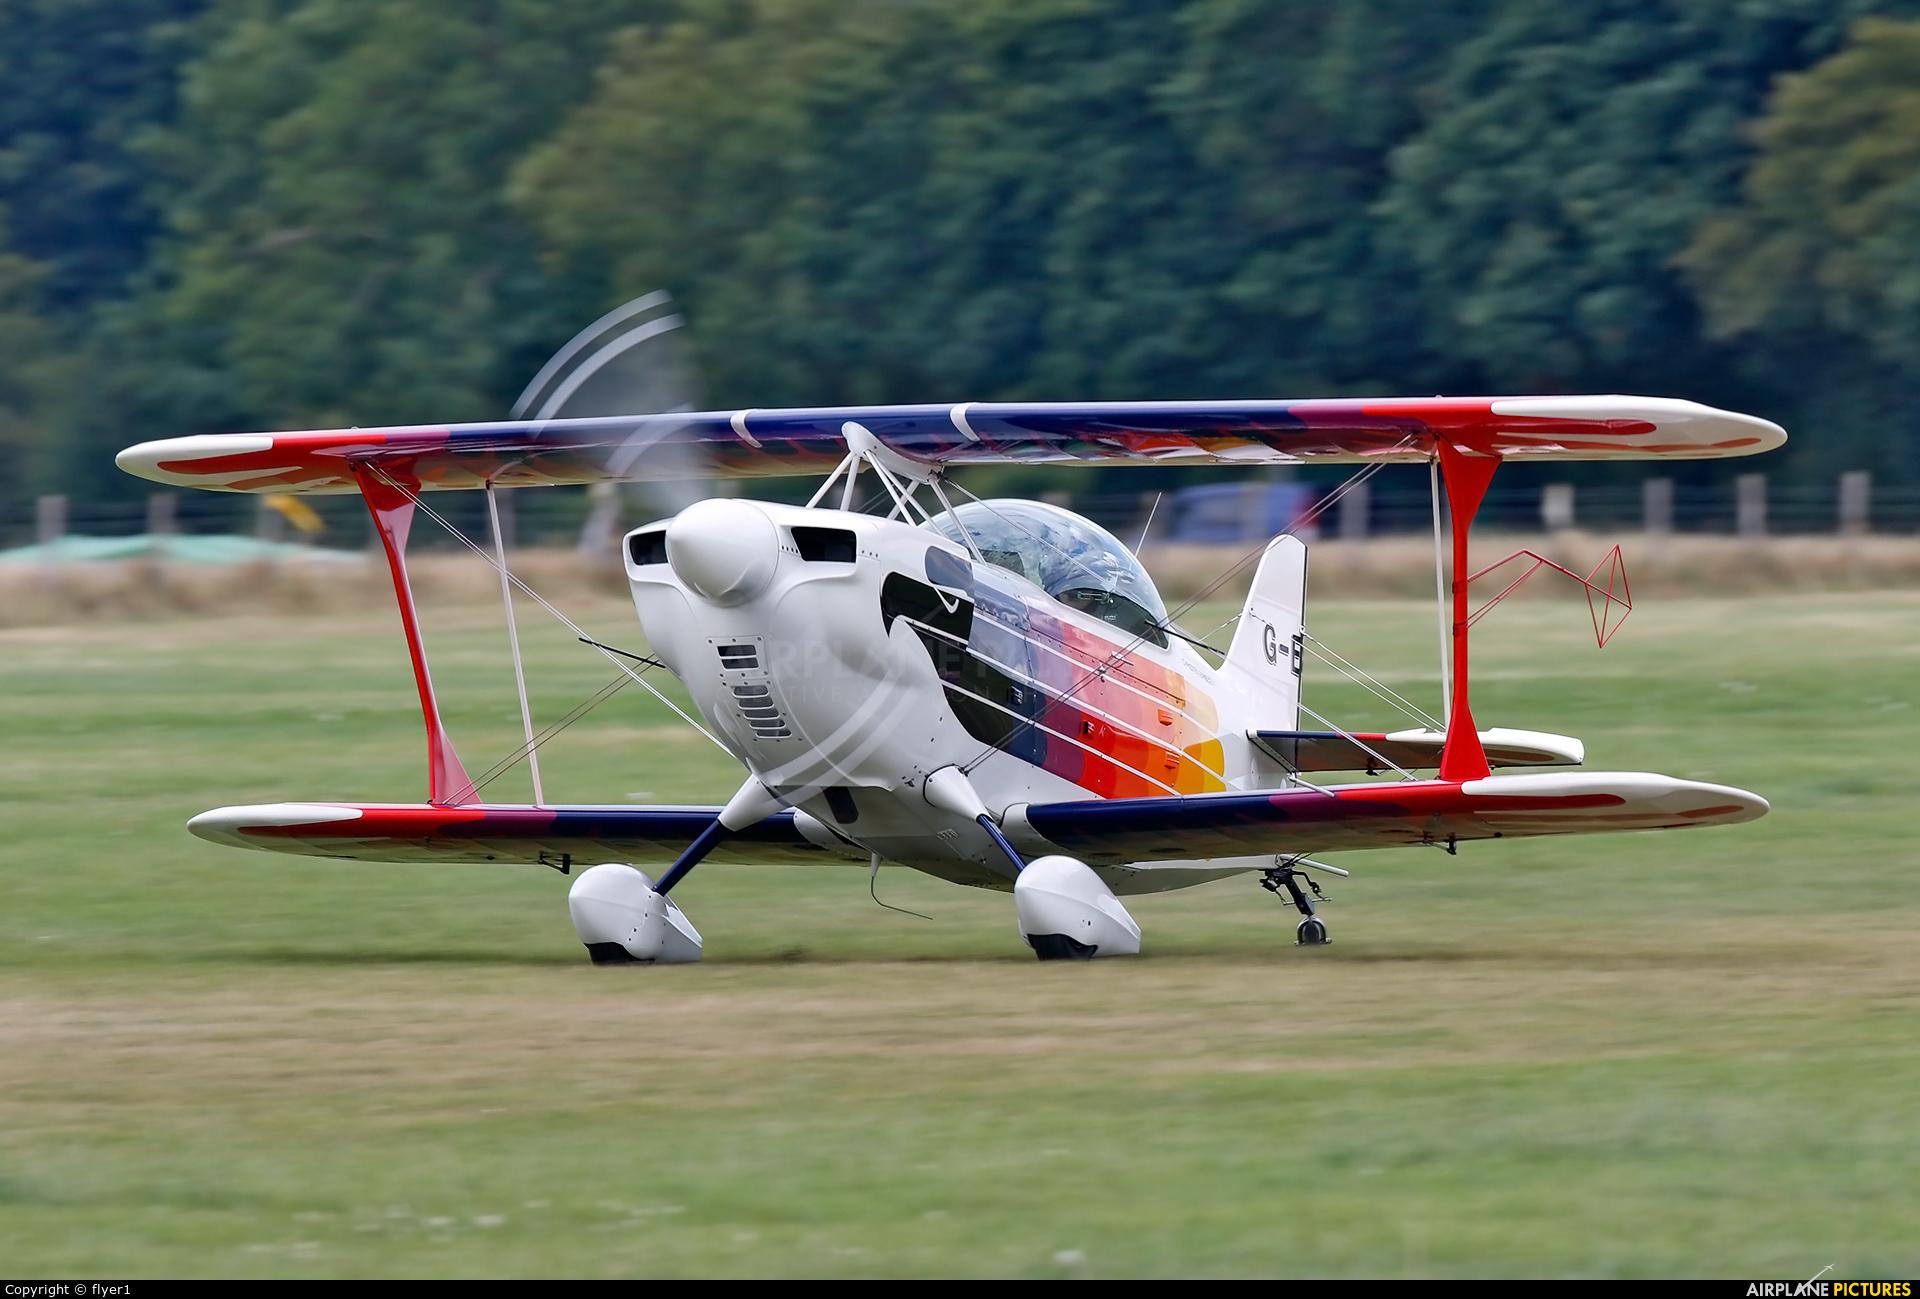 Private G-EGAL aircraft at Lashenden / Headcorn